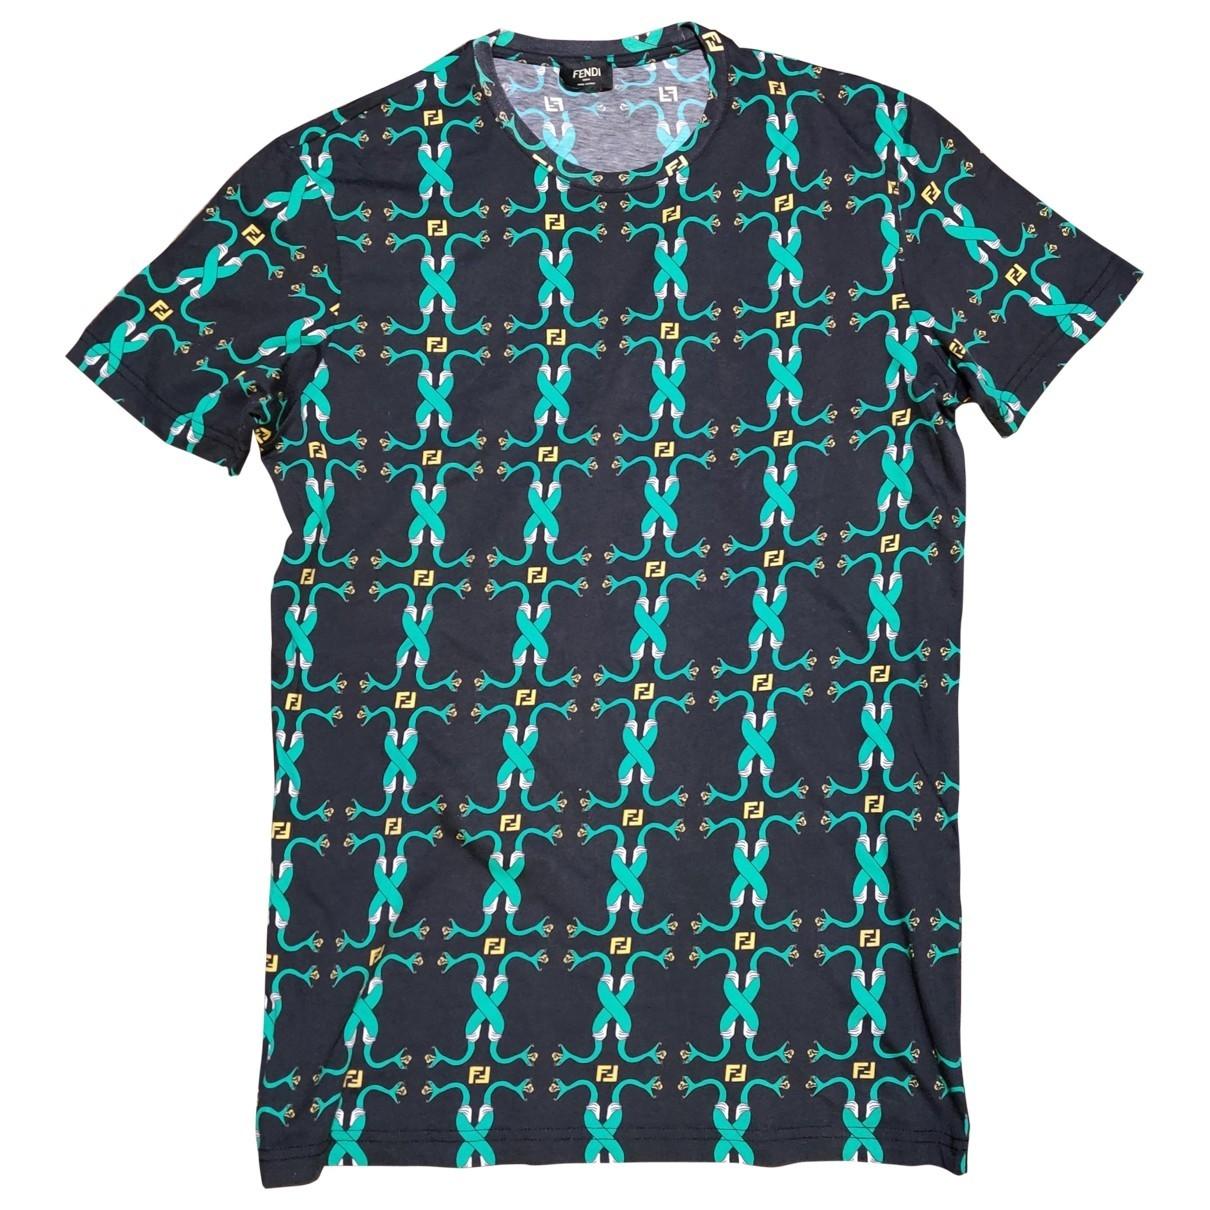 Fendi \N Green Cotton T-shirts for Men M International